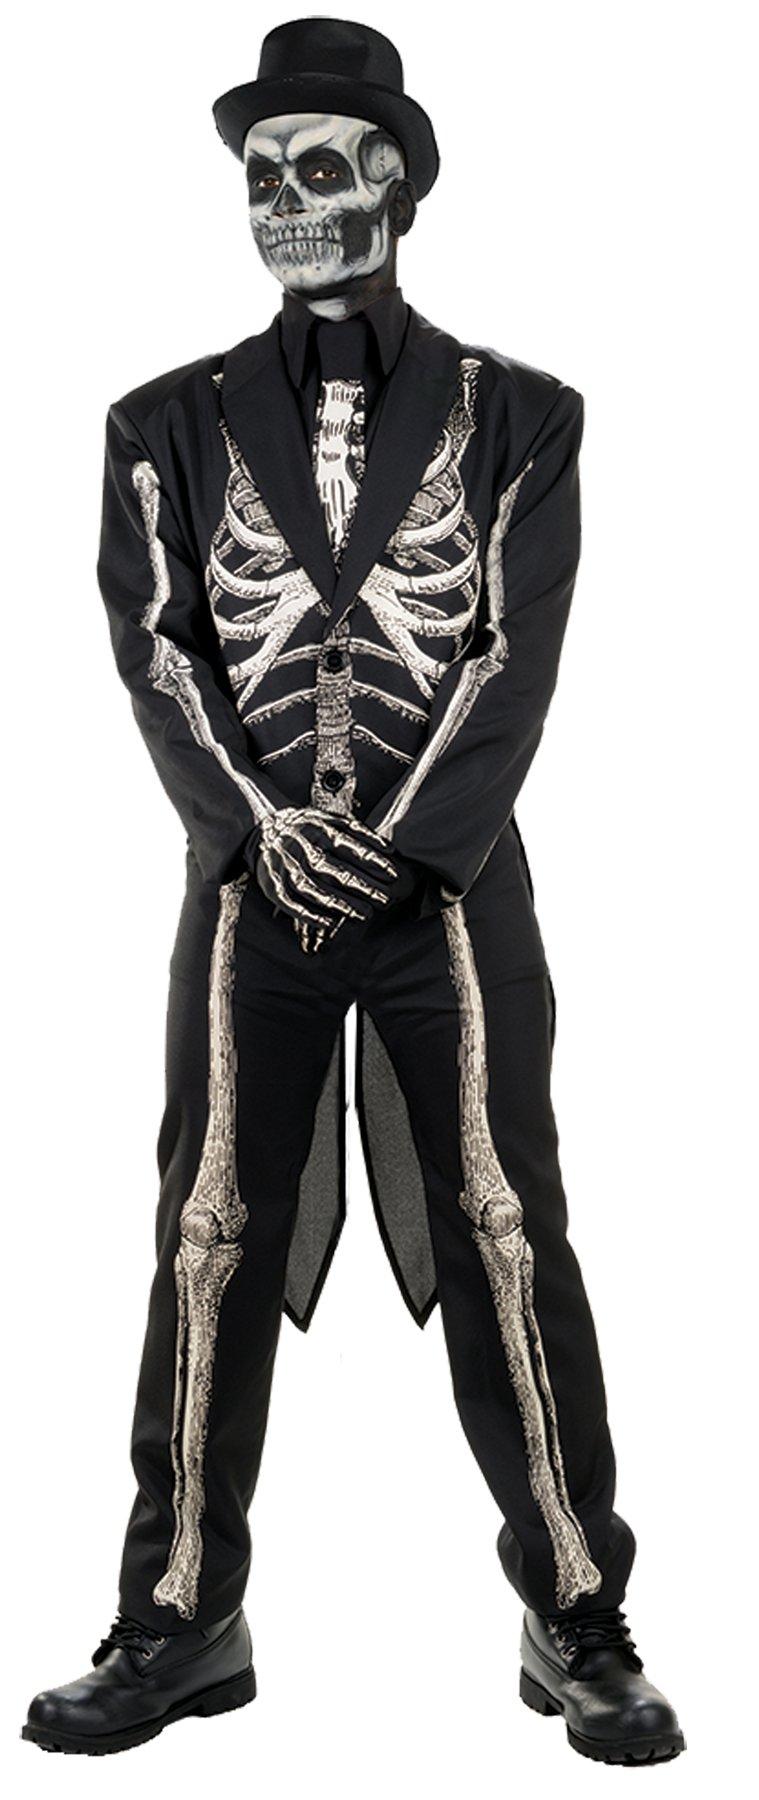 UHC Men's Bone Chillin Skeleton Coat w/ Tails Horror Theme Halloween Costume, STD